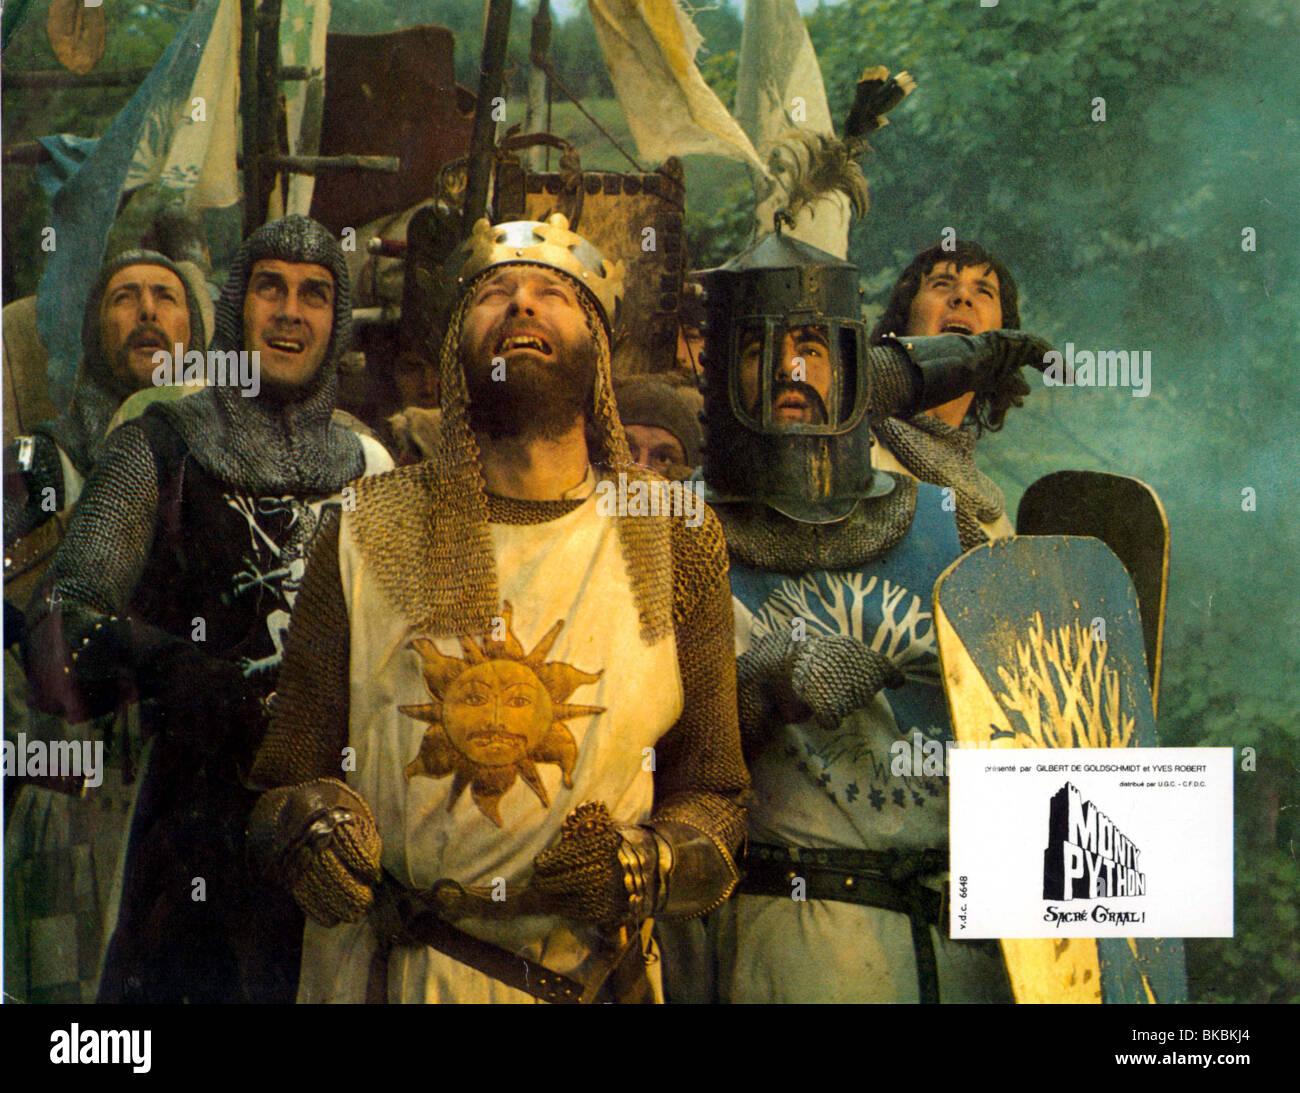 Monty Python The Royal Philharmonic Orchestra Goes To The Bathroom: Eric Idle Graham Chapman Stock Photos & Eric Idle Graham